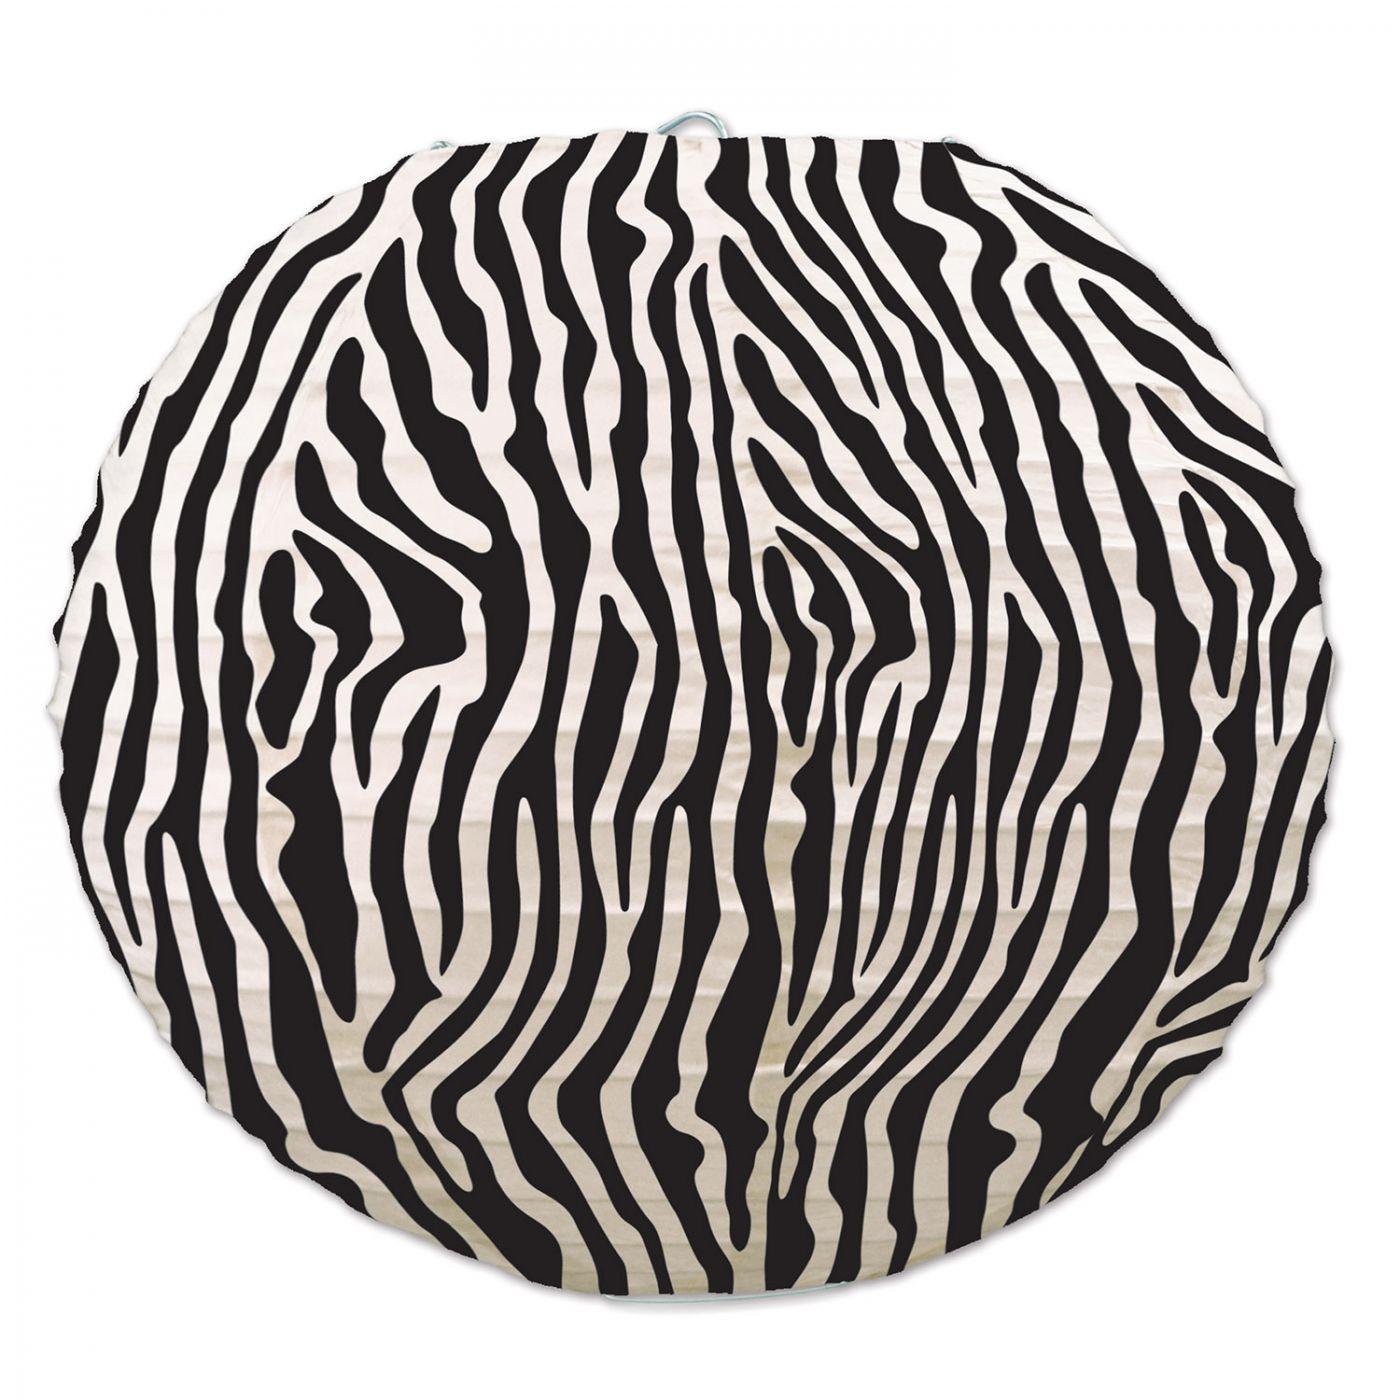 Zebra Print Paper Lanterns (6) image